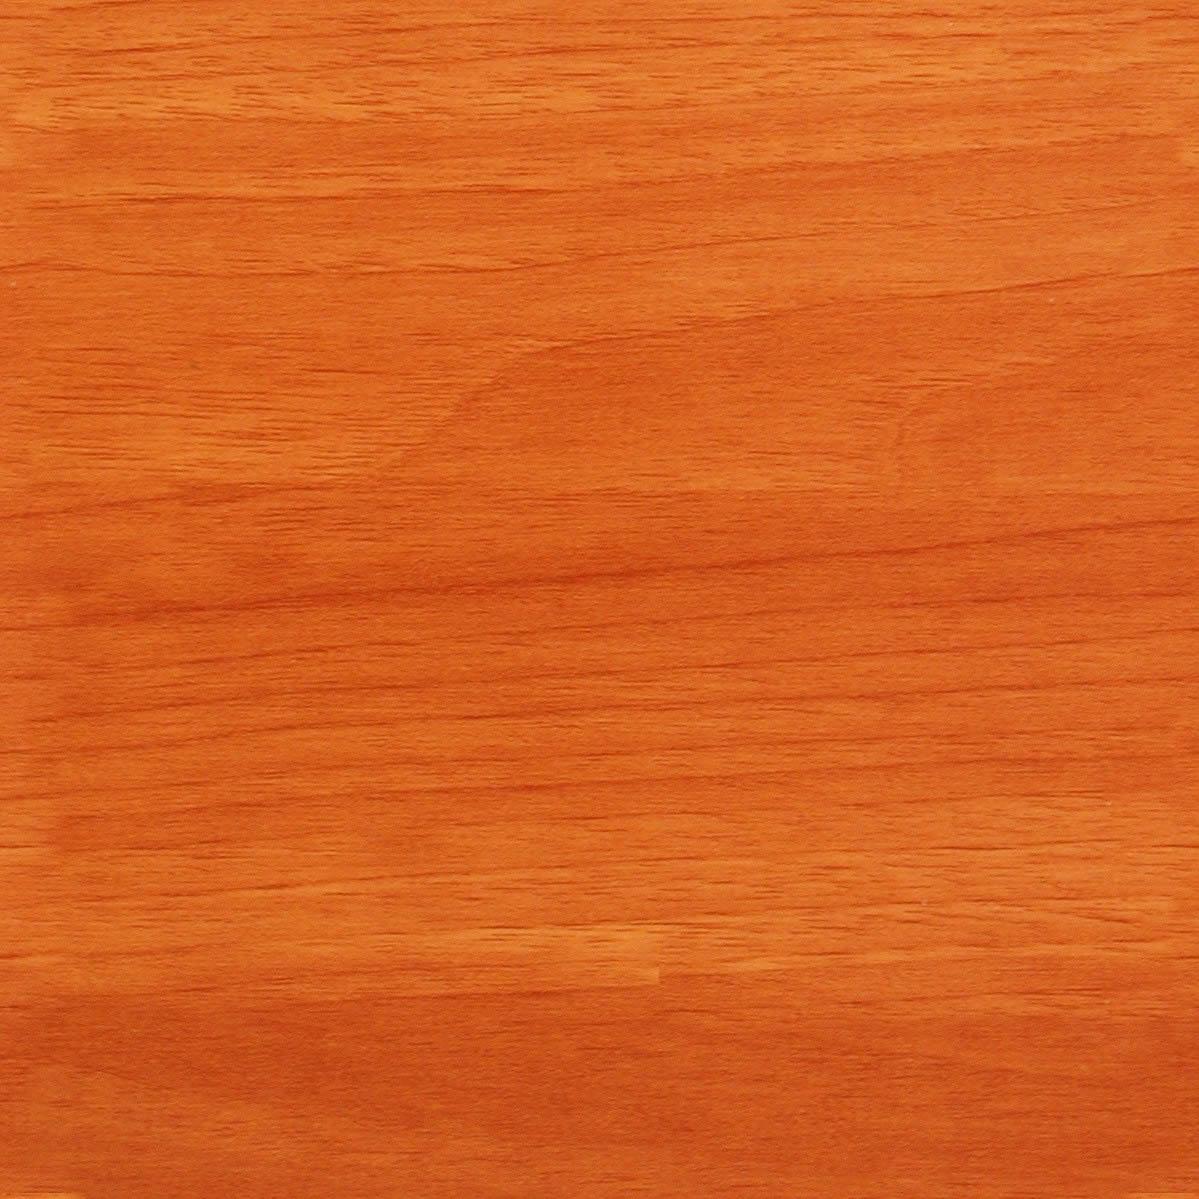 Madera para puertas, en Hatch madera – Texturas